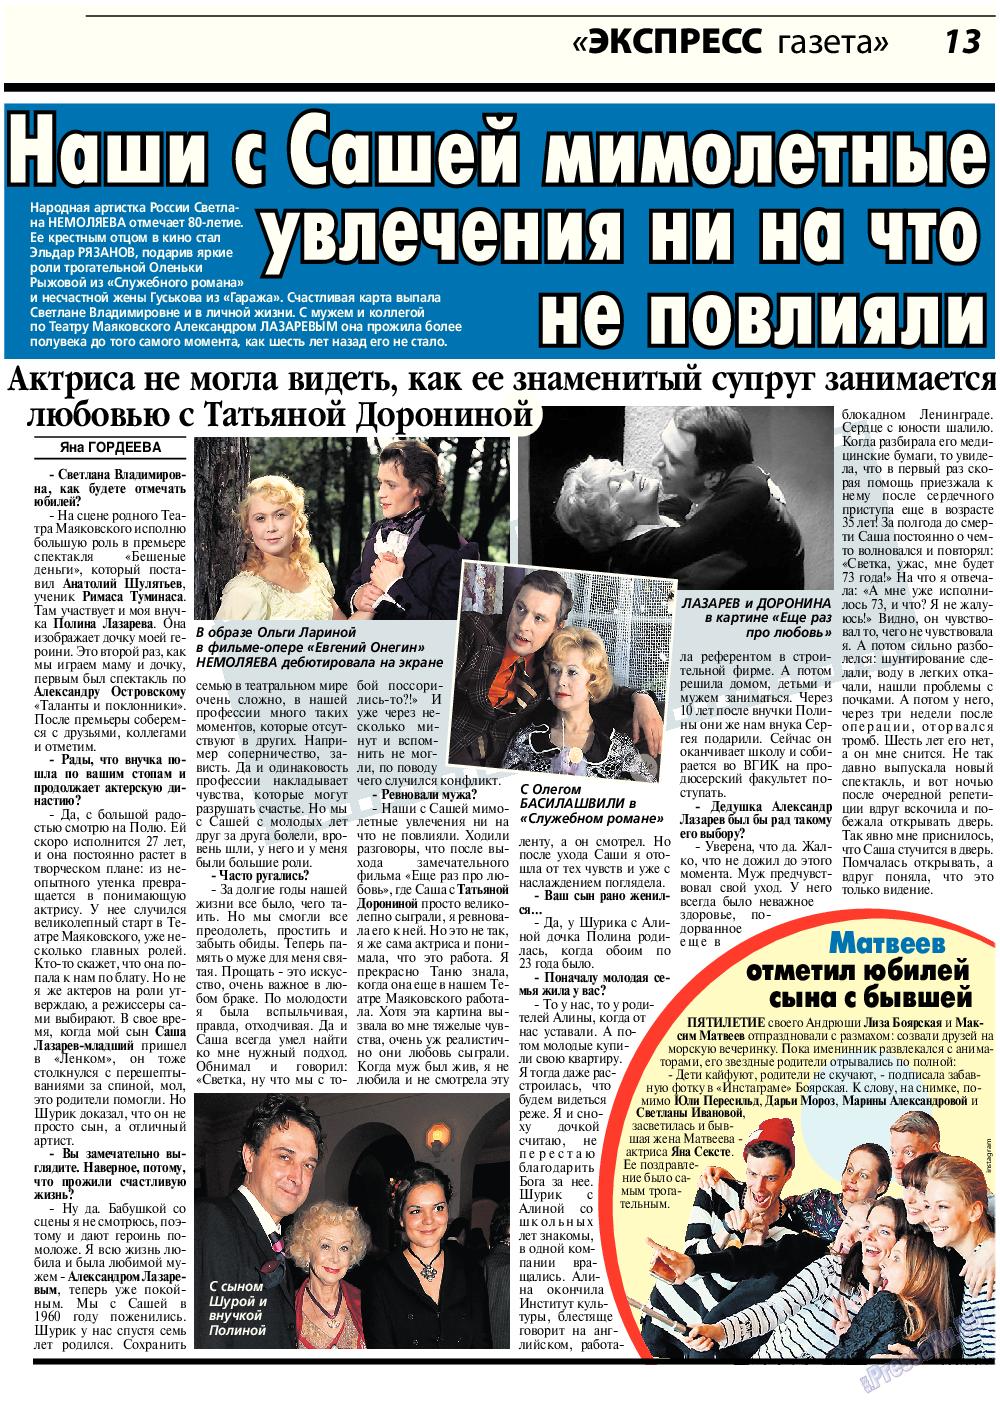 Экспресс газета (газета). 2017 год, номер 5, стр. 13